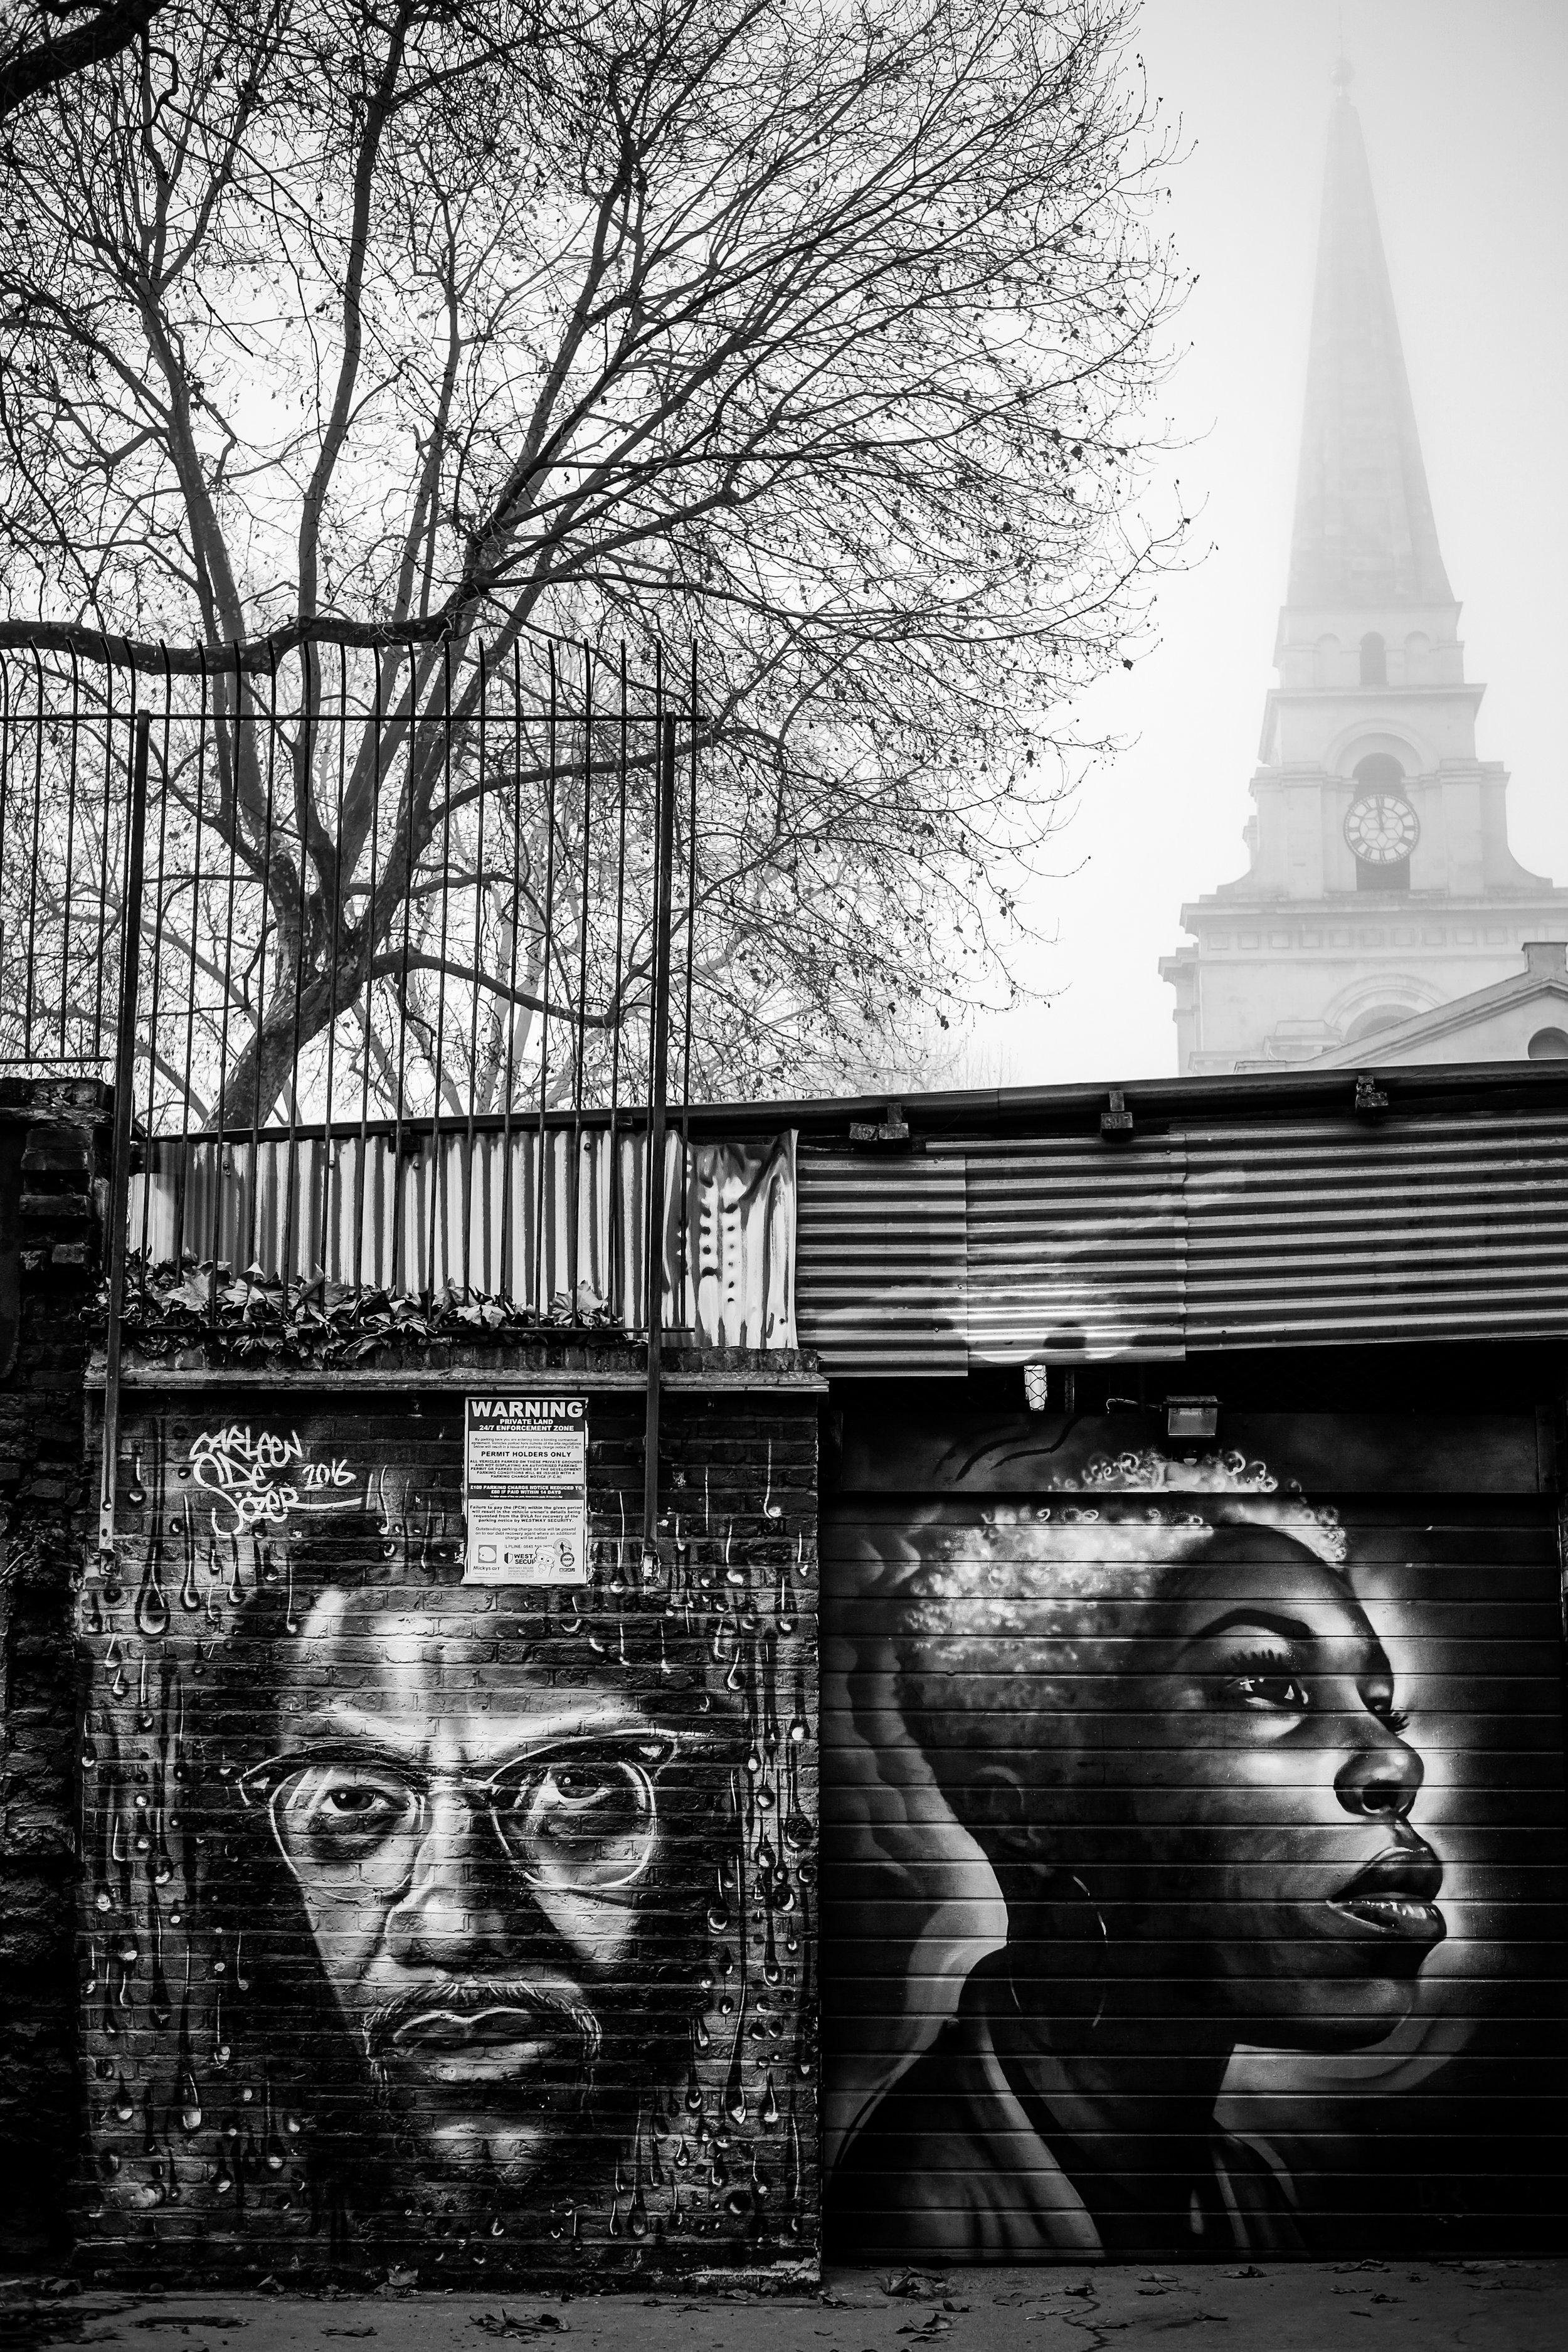 Murals just off Brick Lane